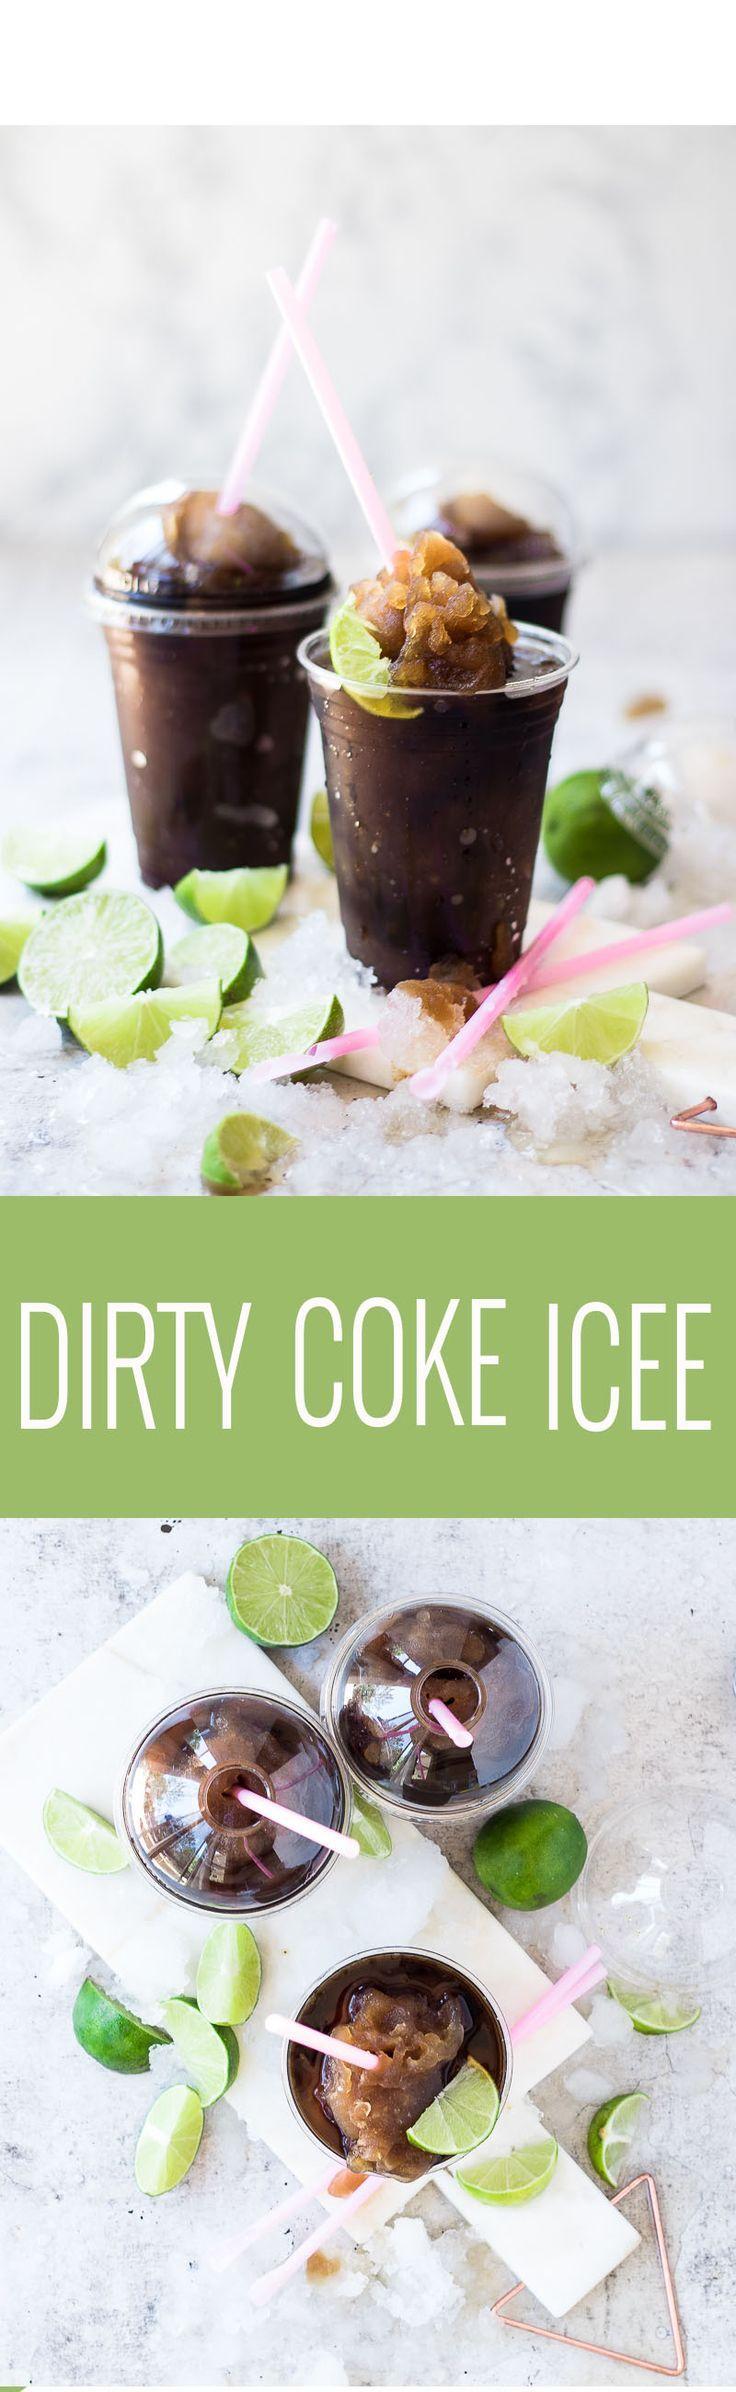 Dirty Coke Icee | homemade icee recipes | recipes using coke | coke icee recipes | coke slushee recipe | how to make a dirty coke icee | homemade frozen treats | homemade summer drinks | homemade summer treats || Oh So Delicioso